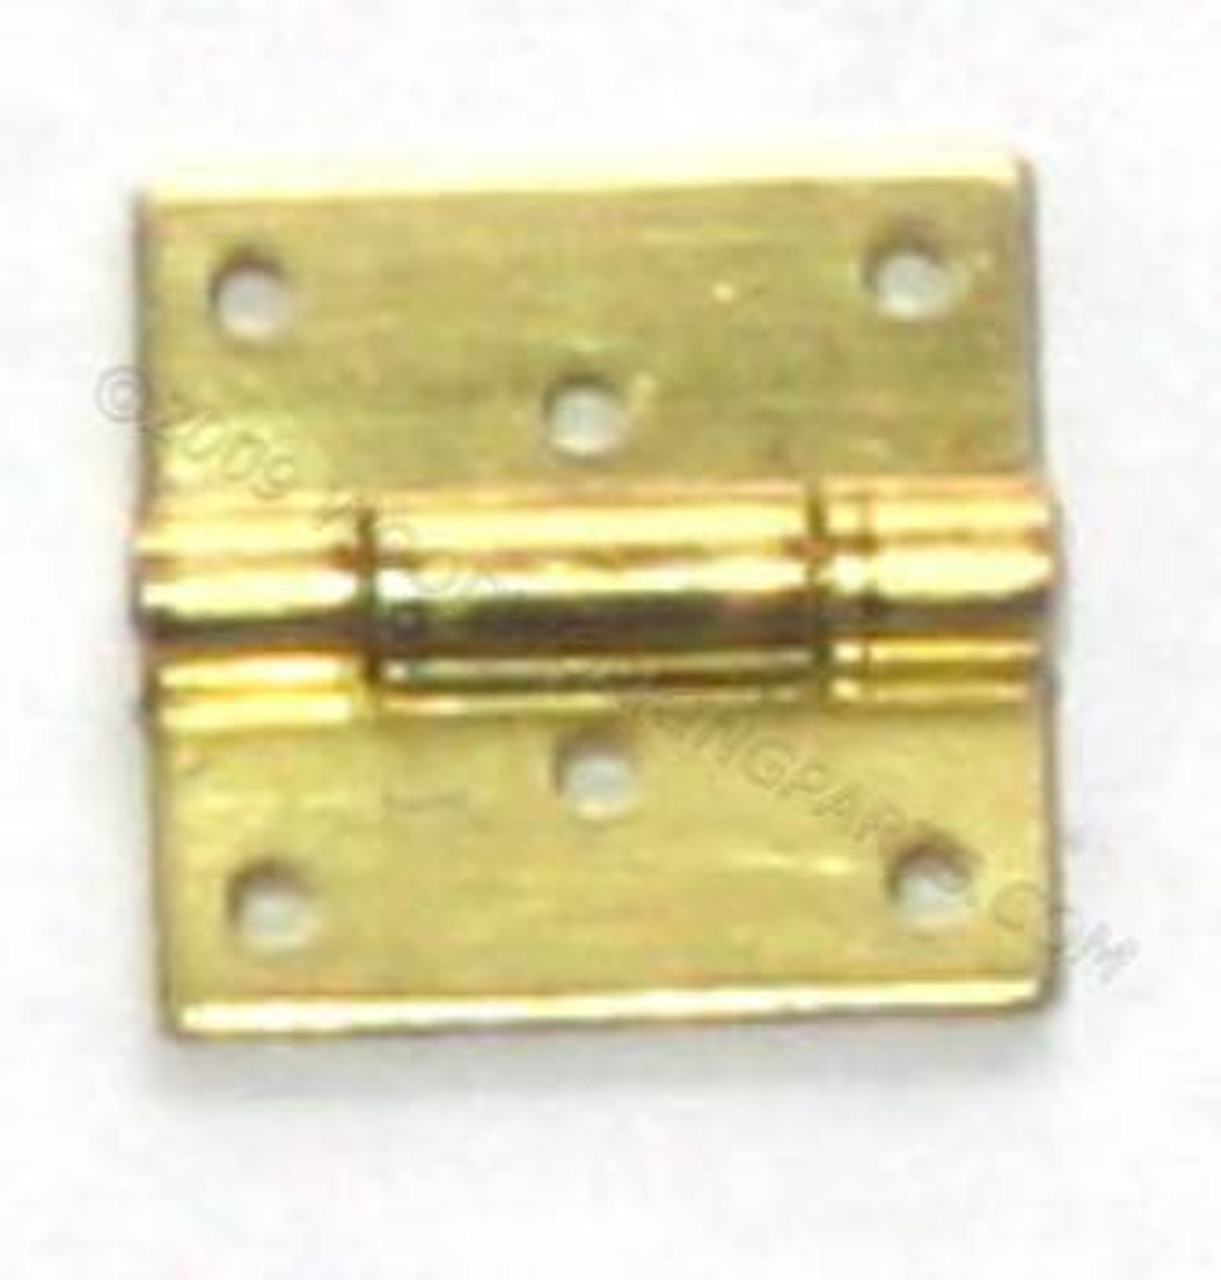 Solid Brass 3/8x3/8 Hinge